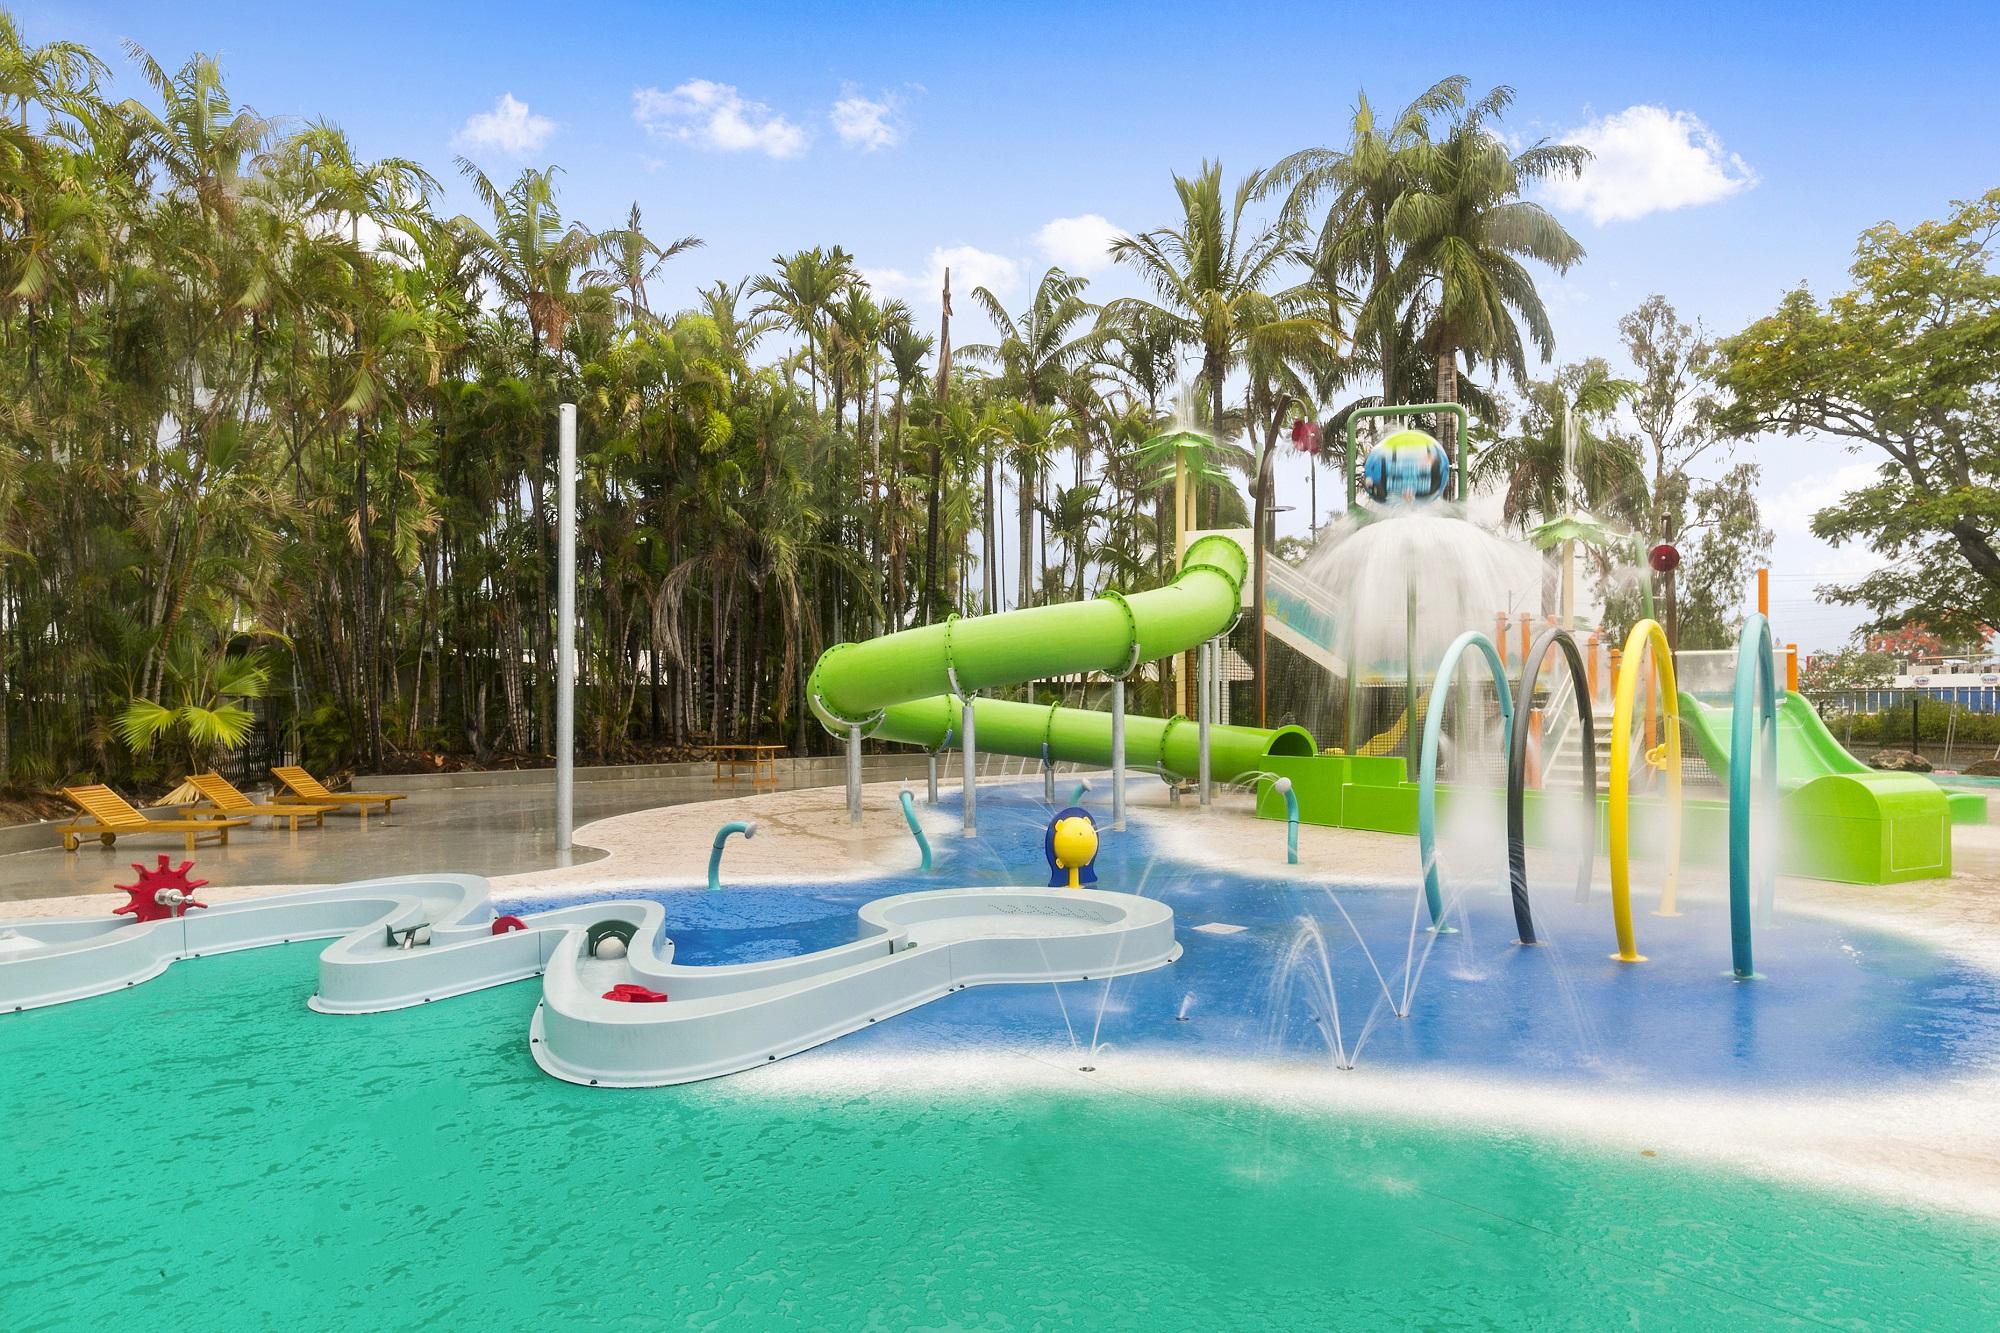 Rockhampton Holiday & Caravan Park, Capricorn, QLD